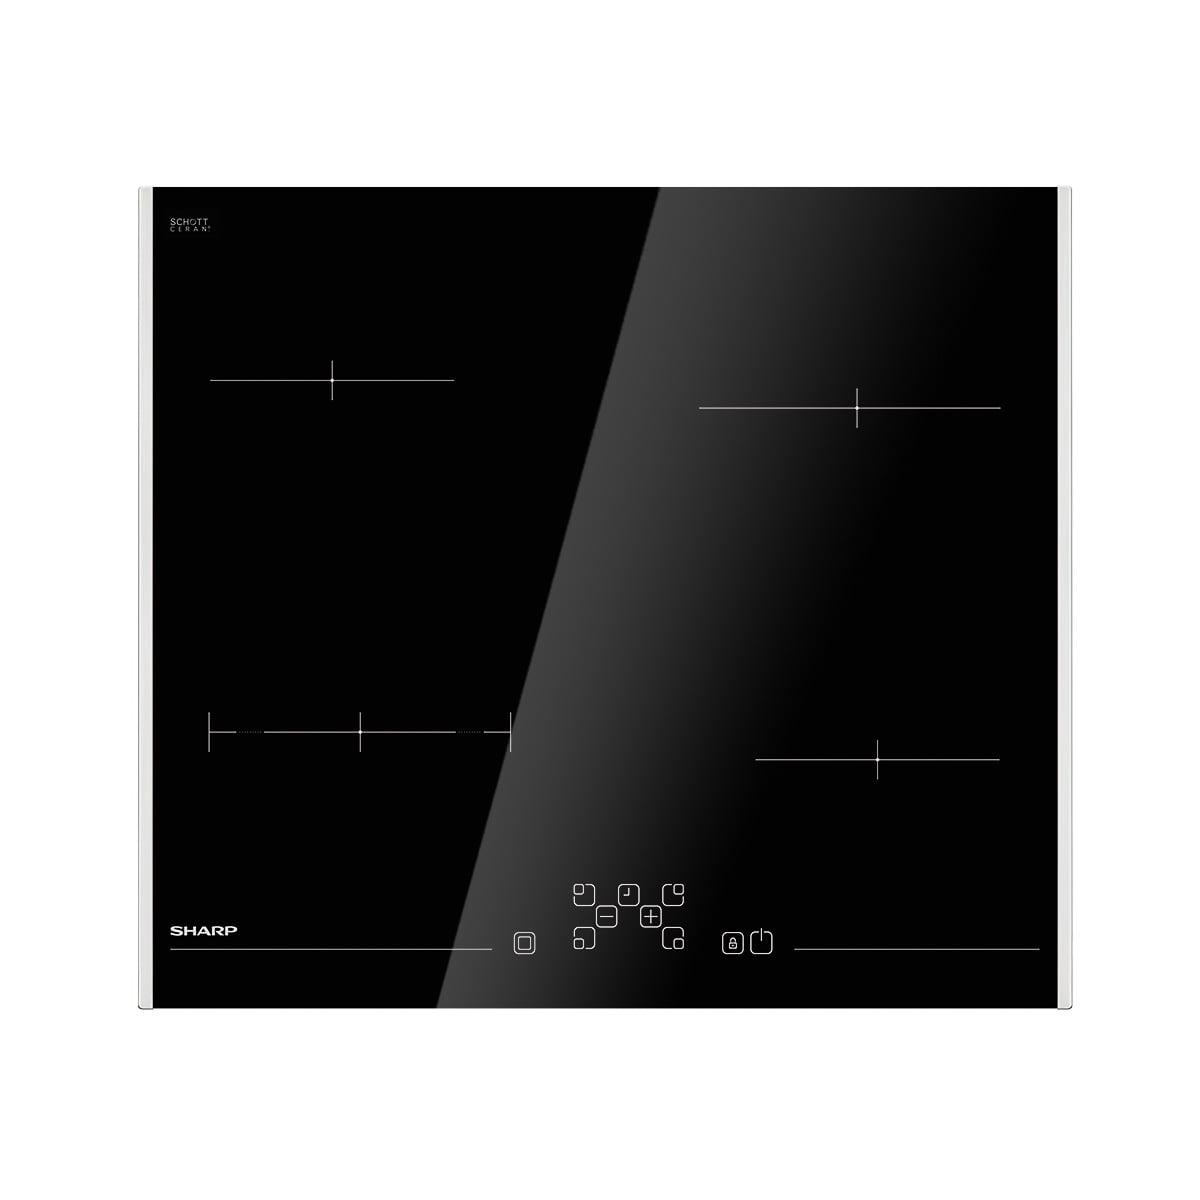 Ugradna ploča - Sharp KH-6V08FT00 ploca odgore